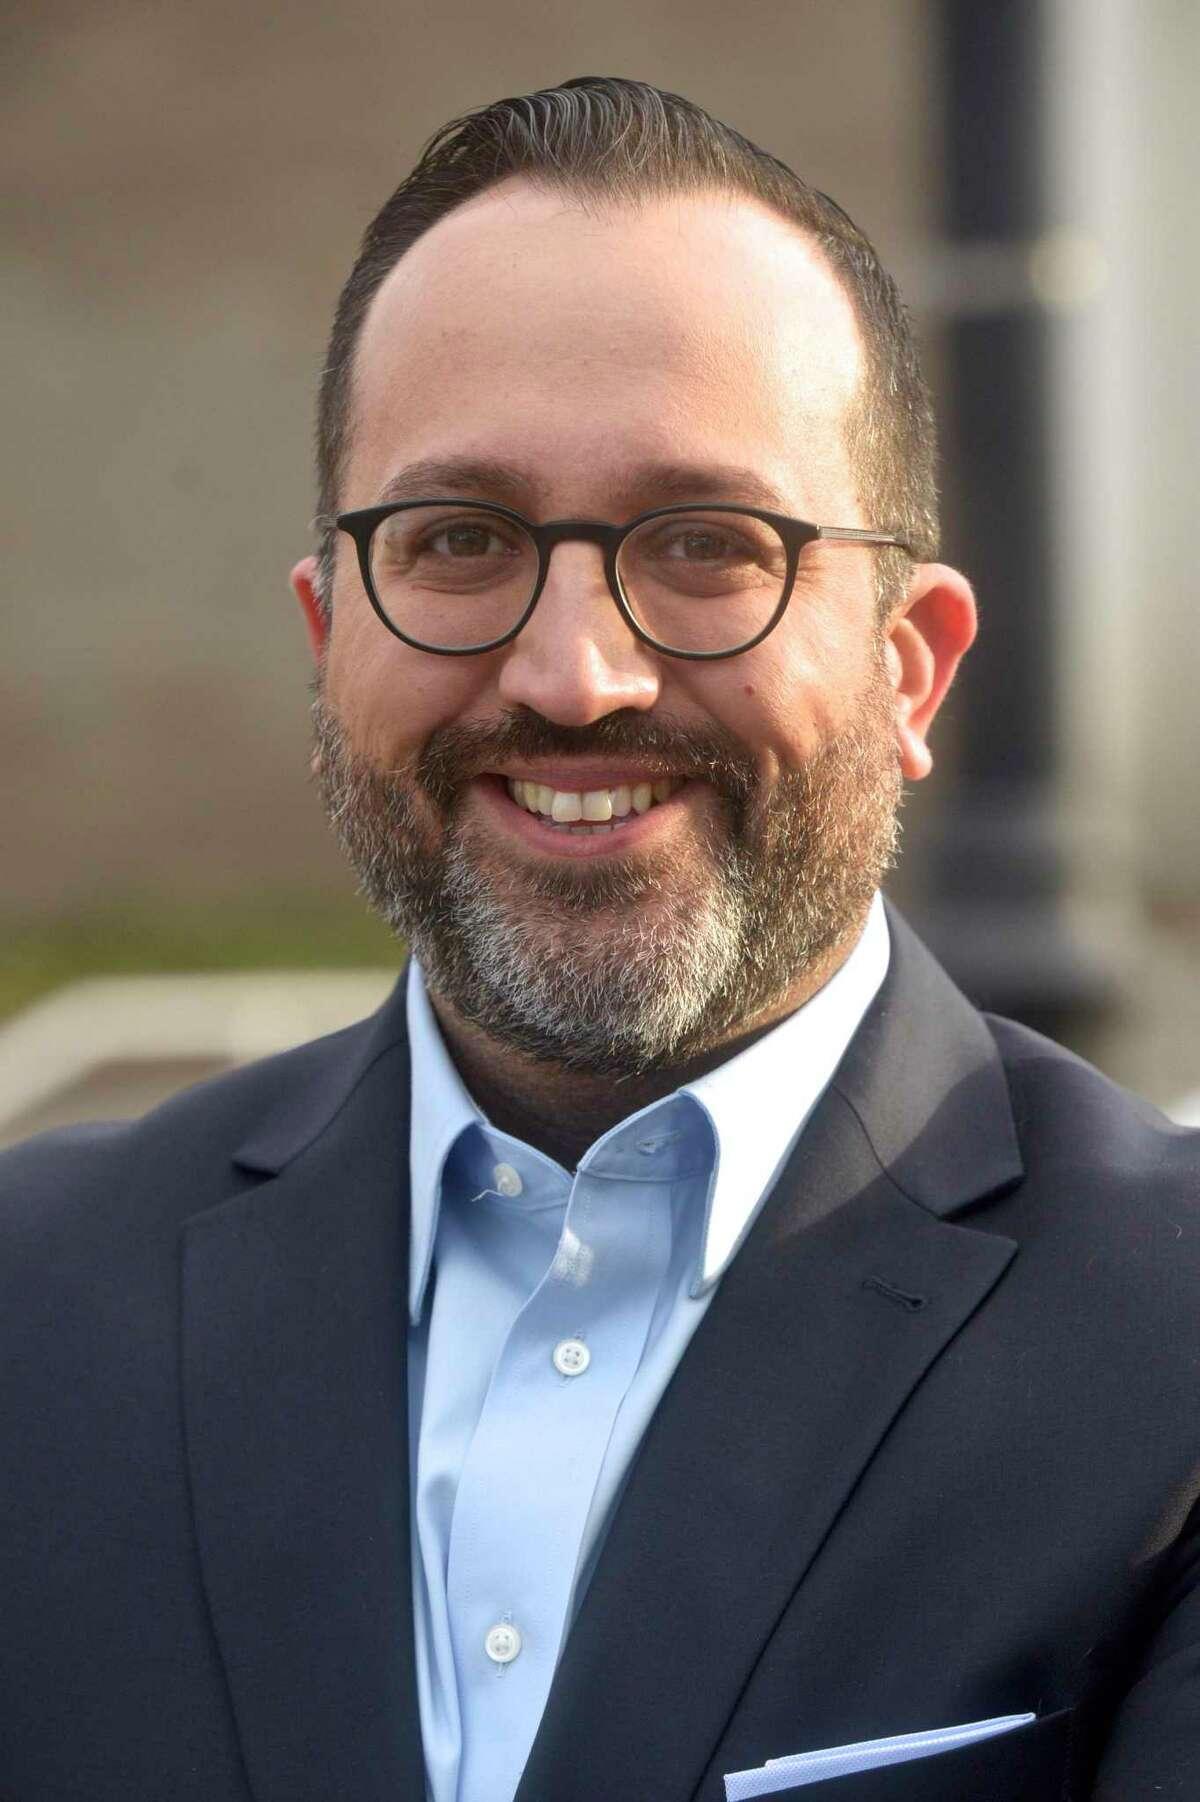 Democrat Roberto Alves announced he is running for mayor of Danbury. Friday, January 8, 2021, in Danbury, Conn.